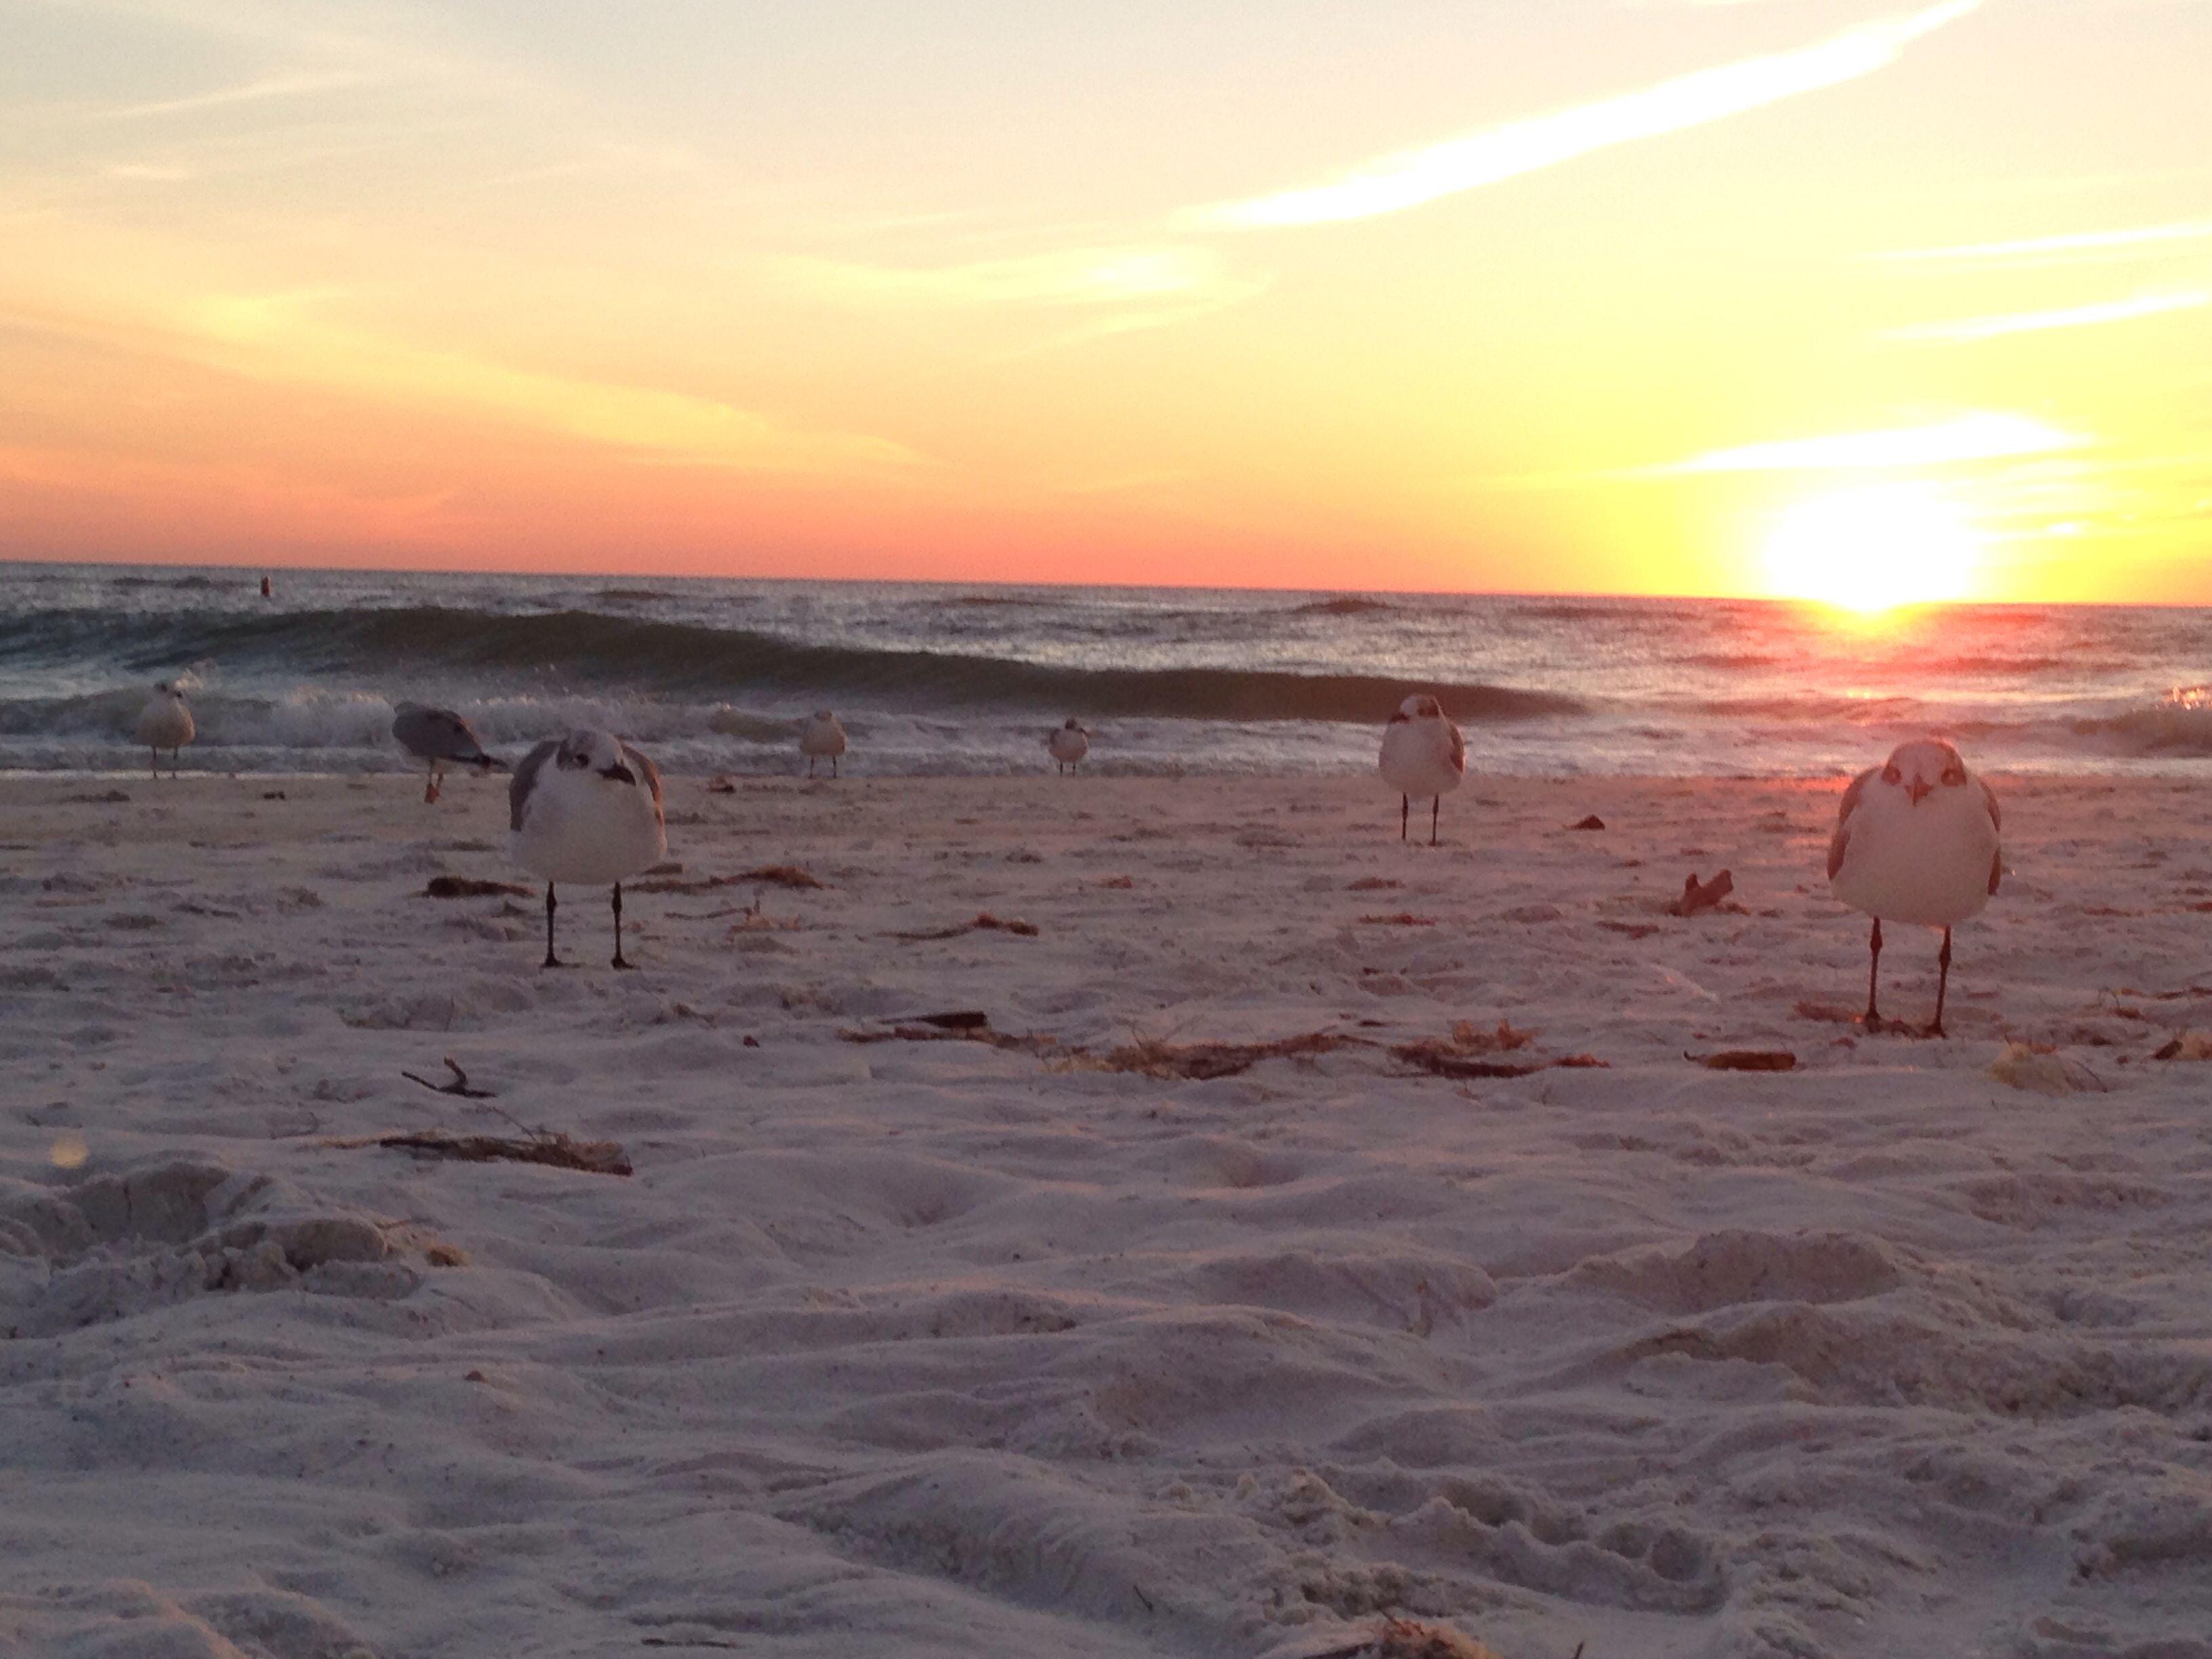 Little friends on North Lido Beach, Sarasota. - intenseone